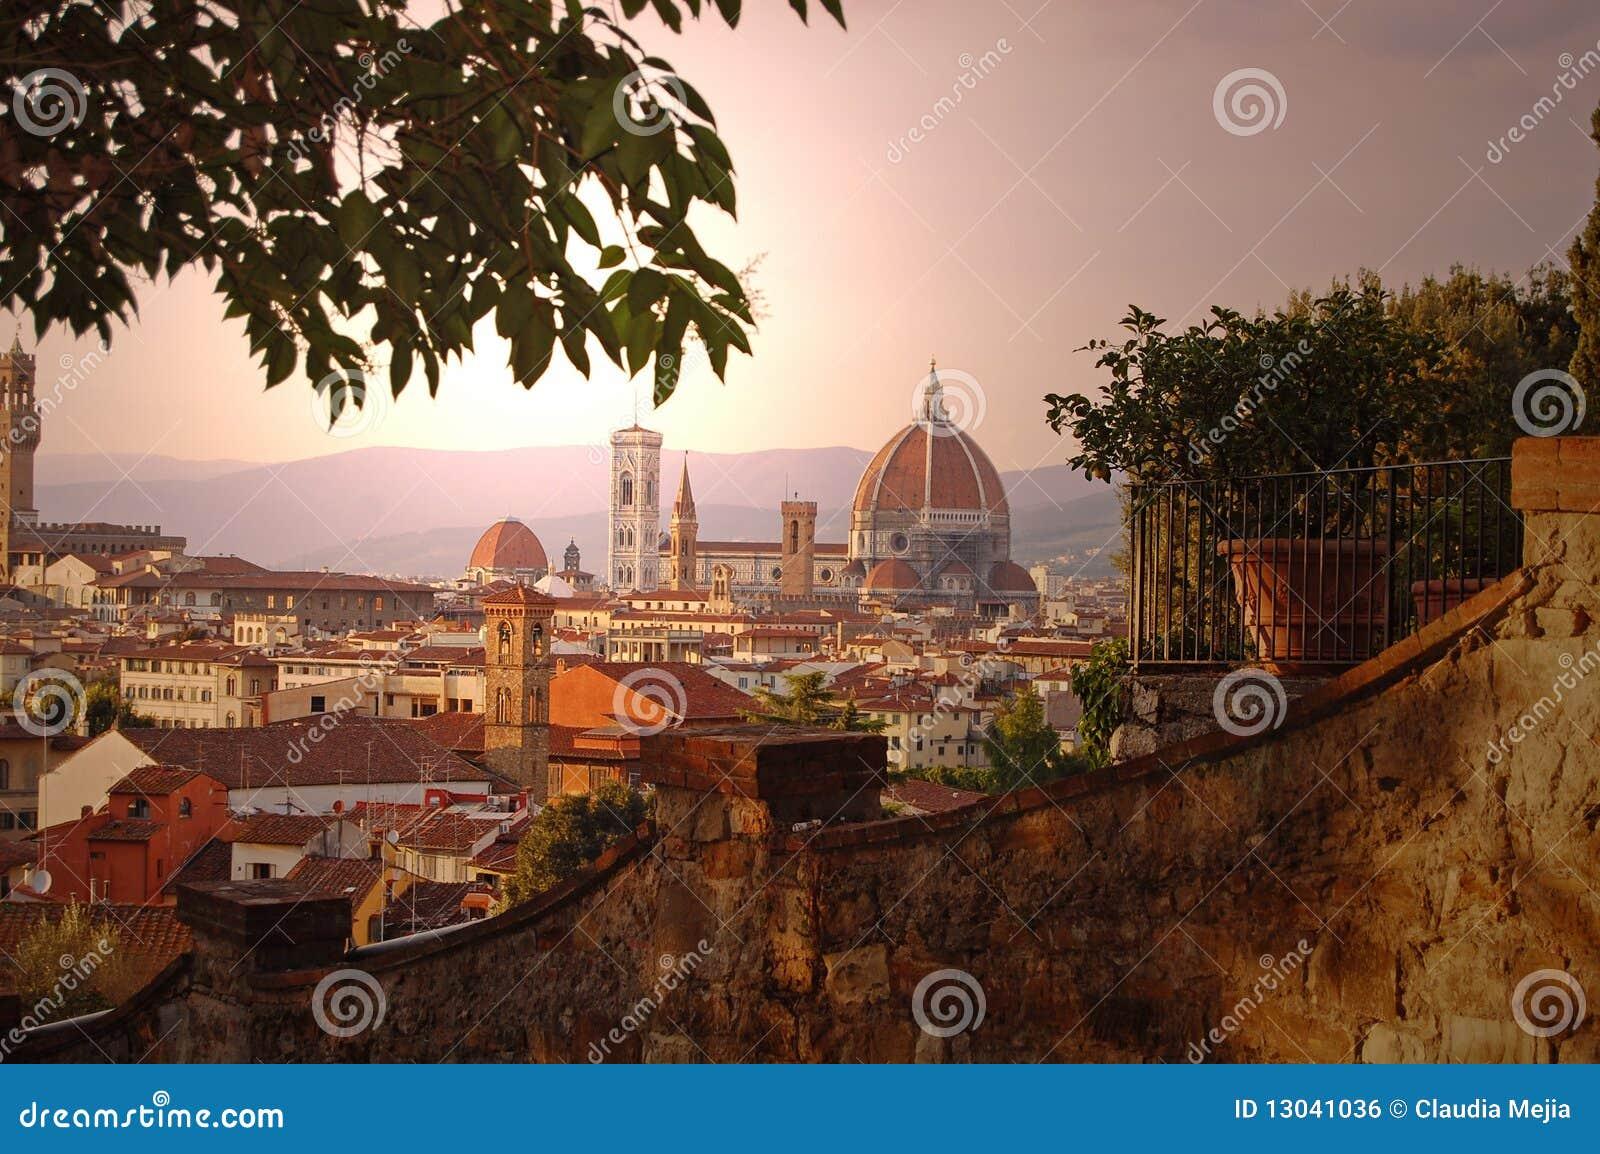 Duomoflorence michelangelo piazzale